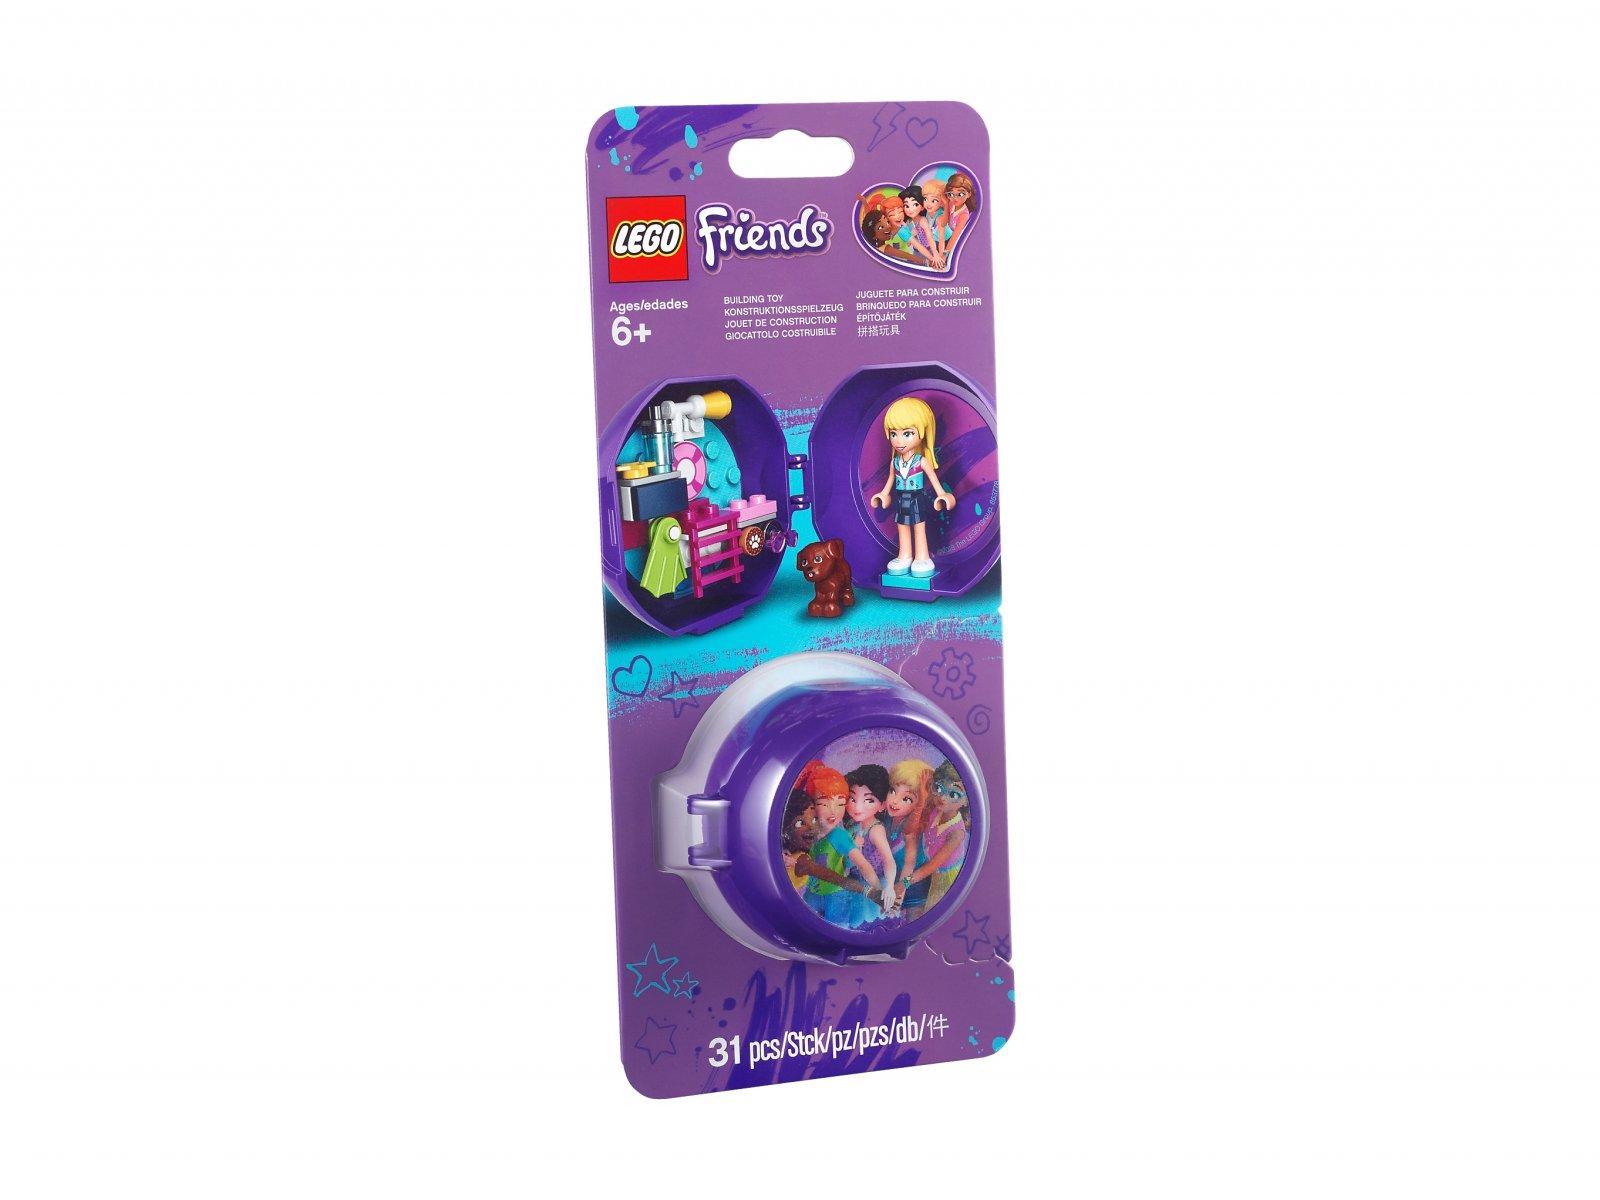 LEGO 853778 Basen Stephanie - kapsuła